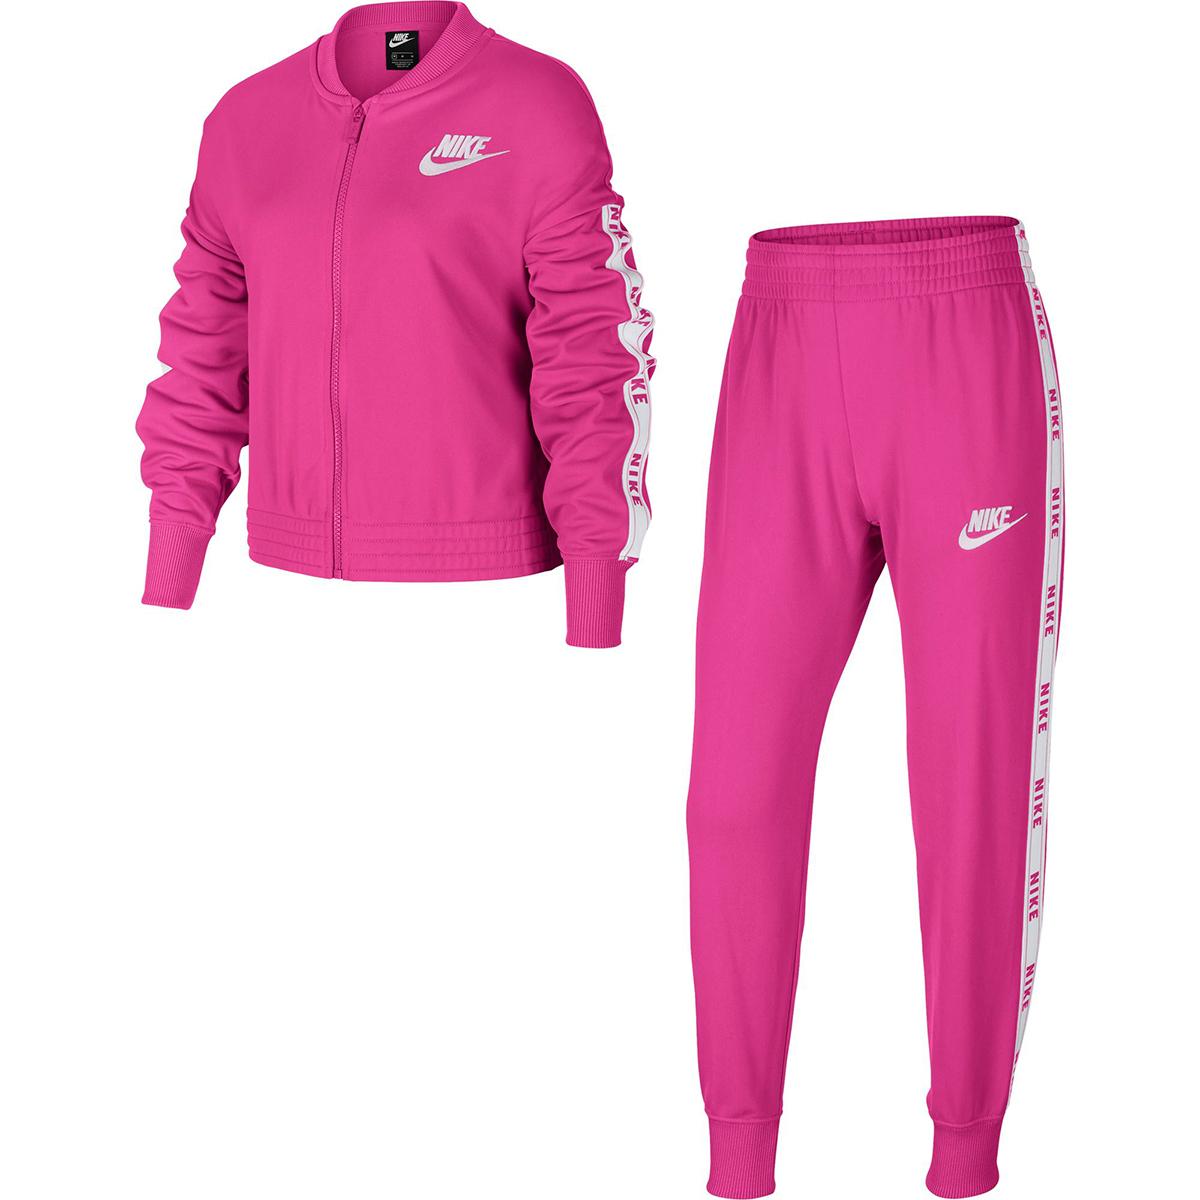 Nike Girls' Sportswear Tracksuit - Red, M